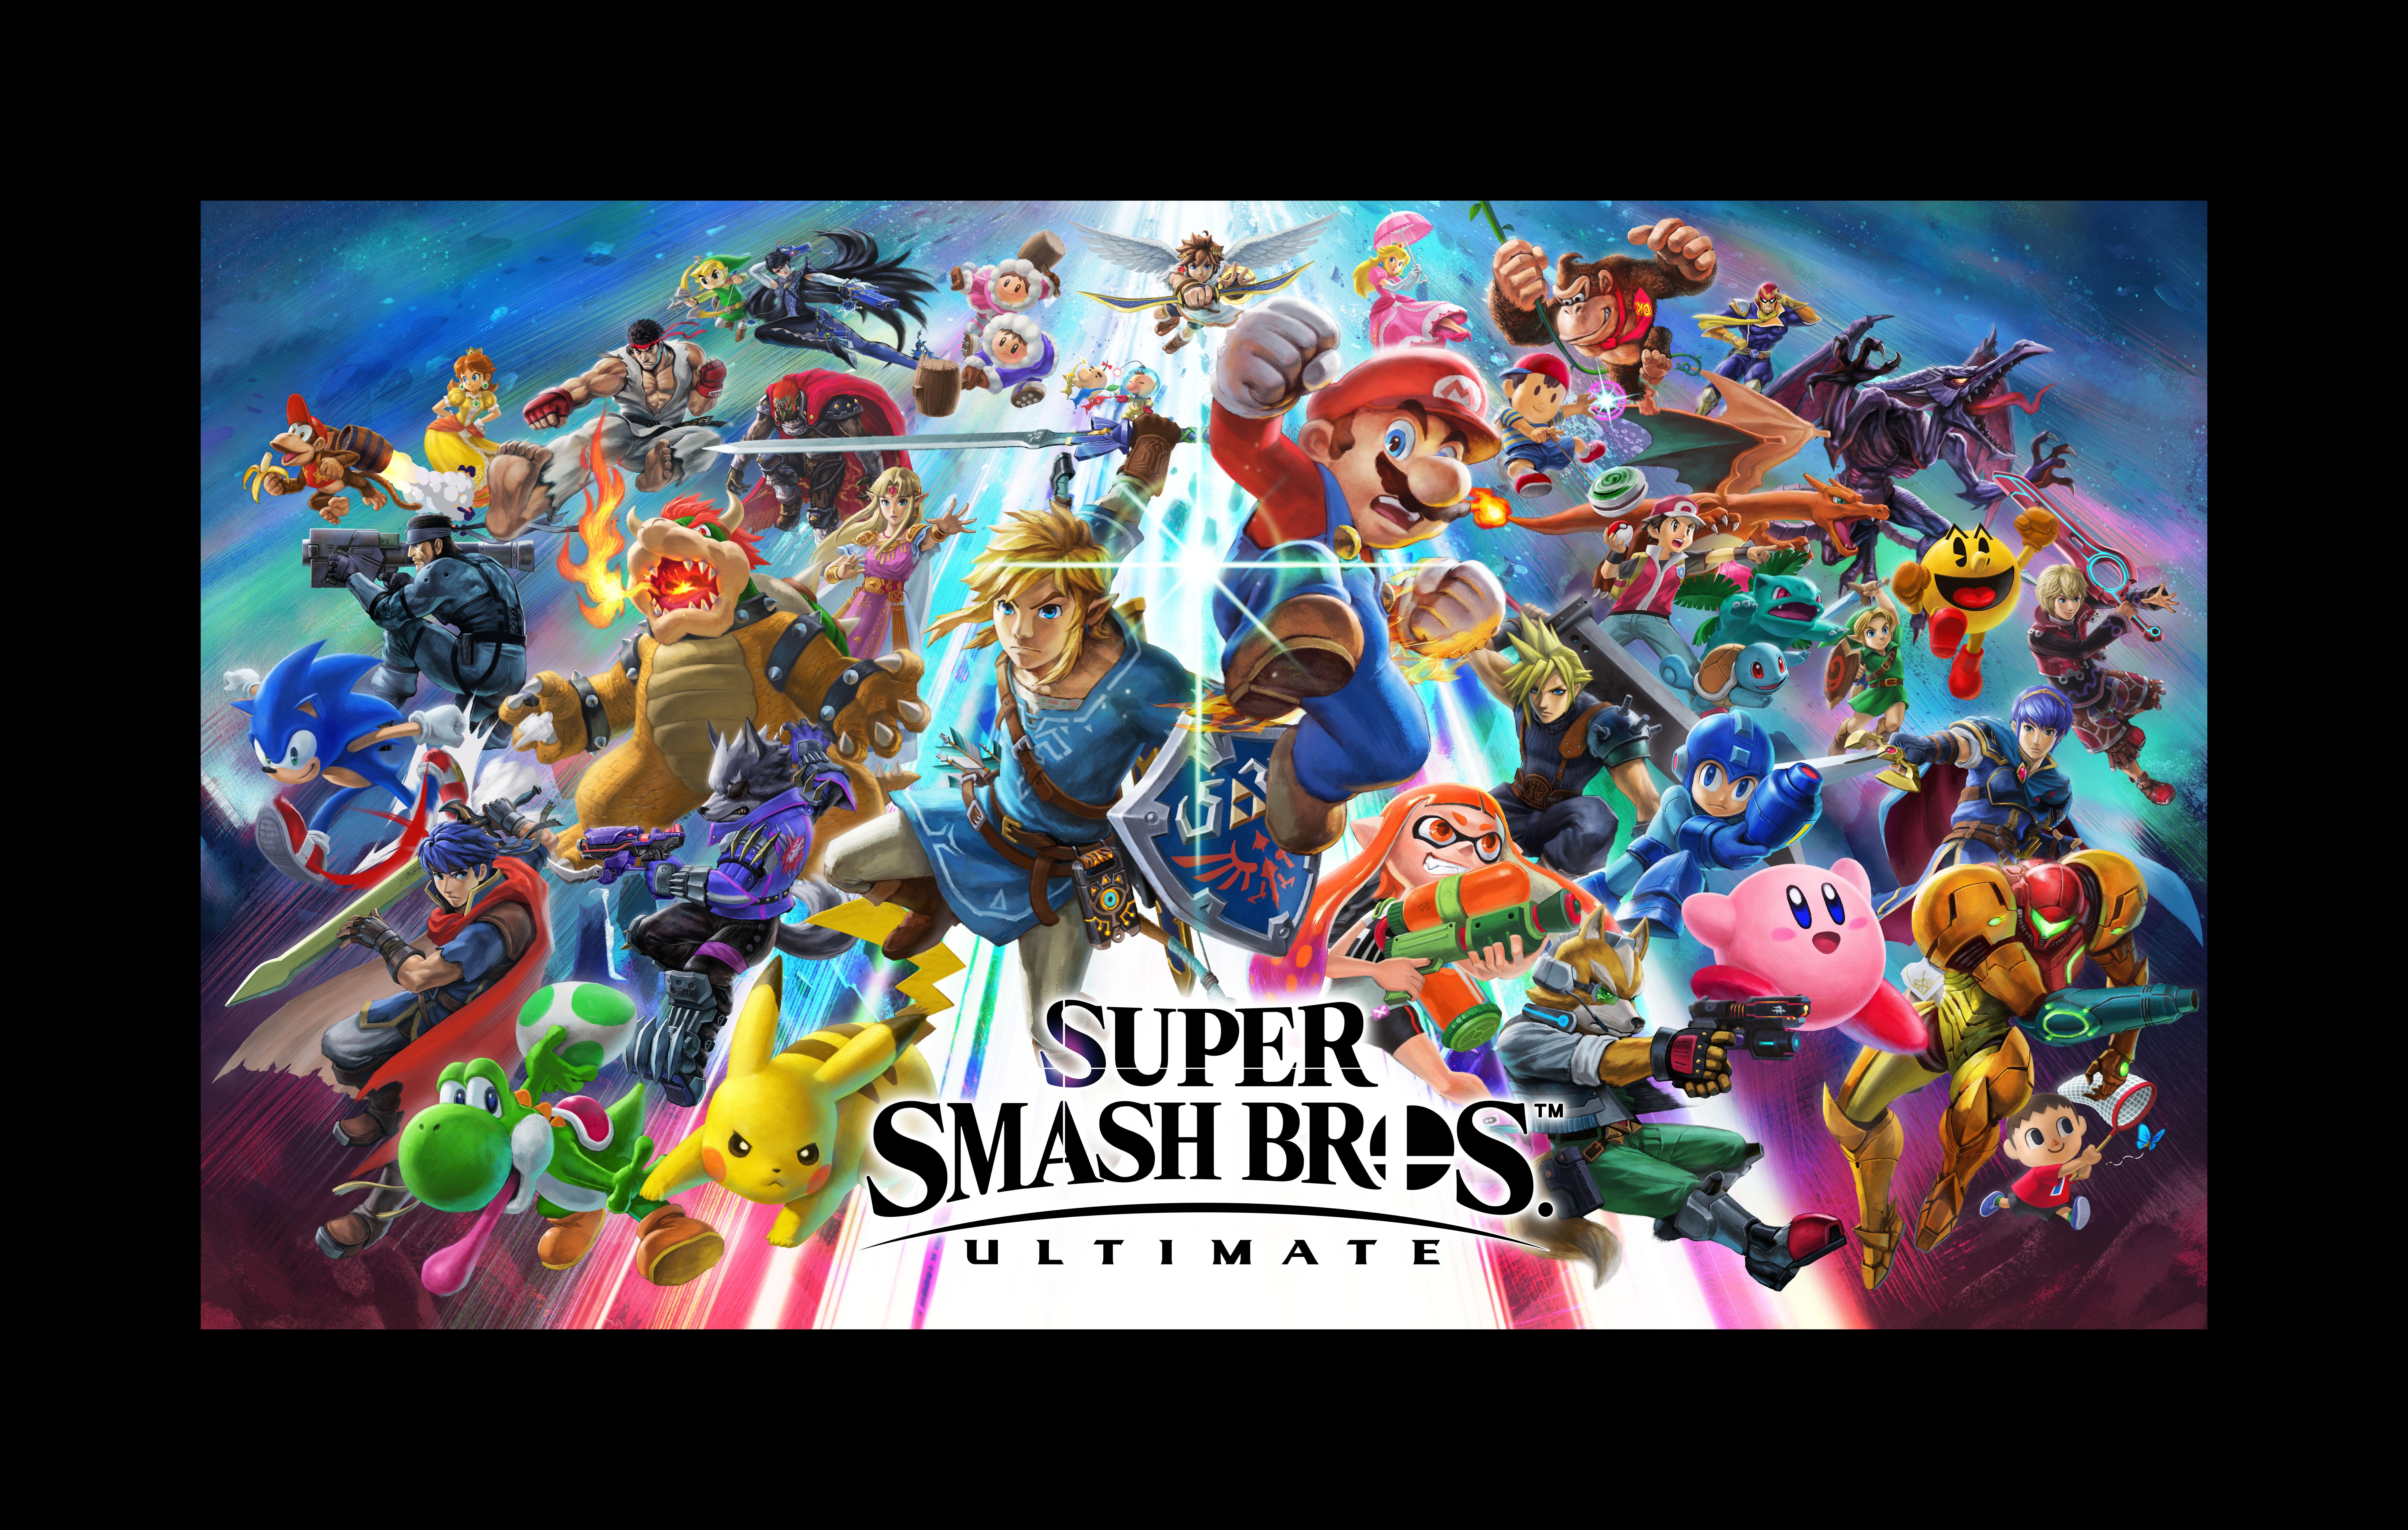 Super Smash Bros: Ultimate - Super Smash Bros. Ultimate 9K, Арт